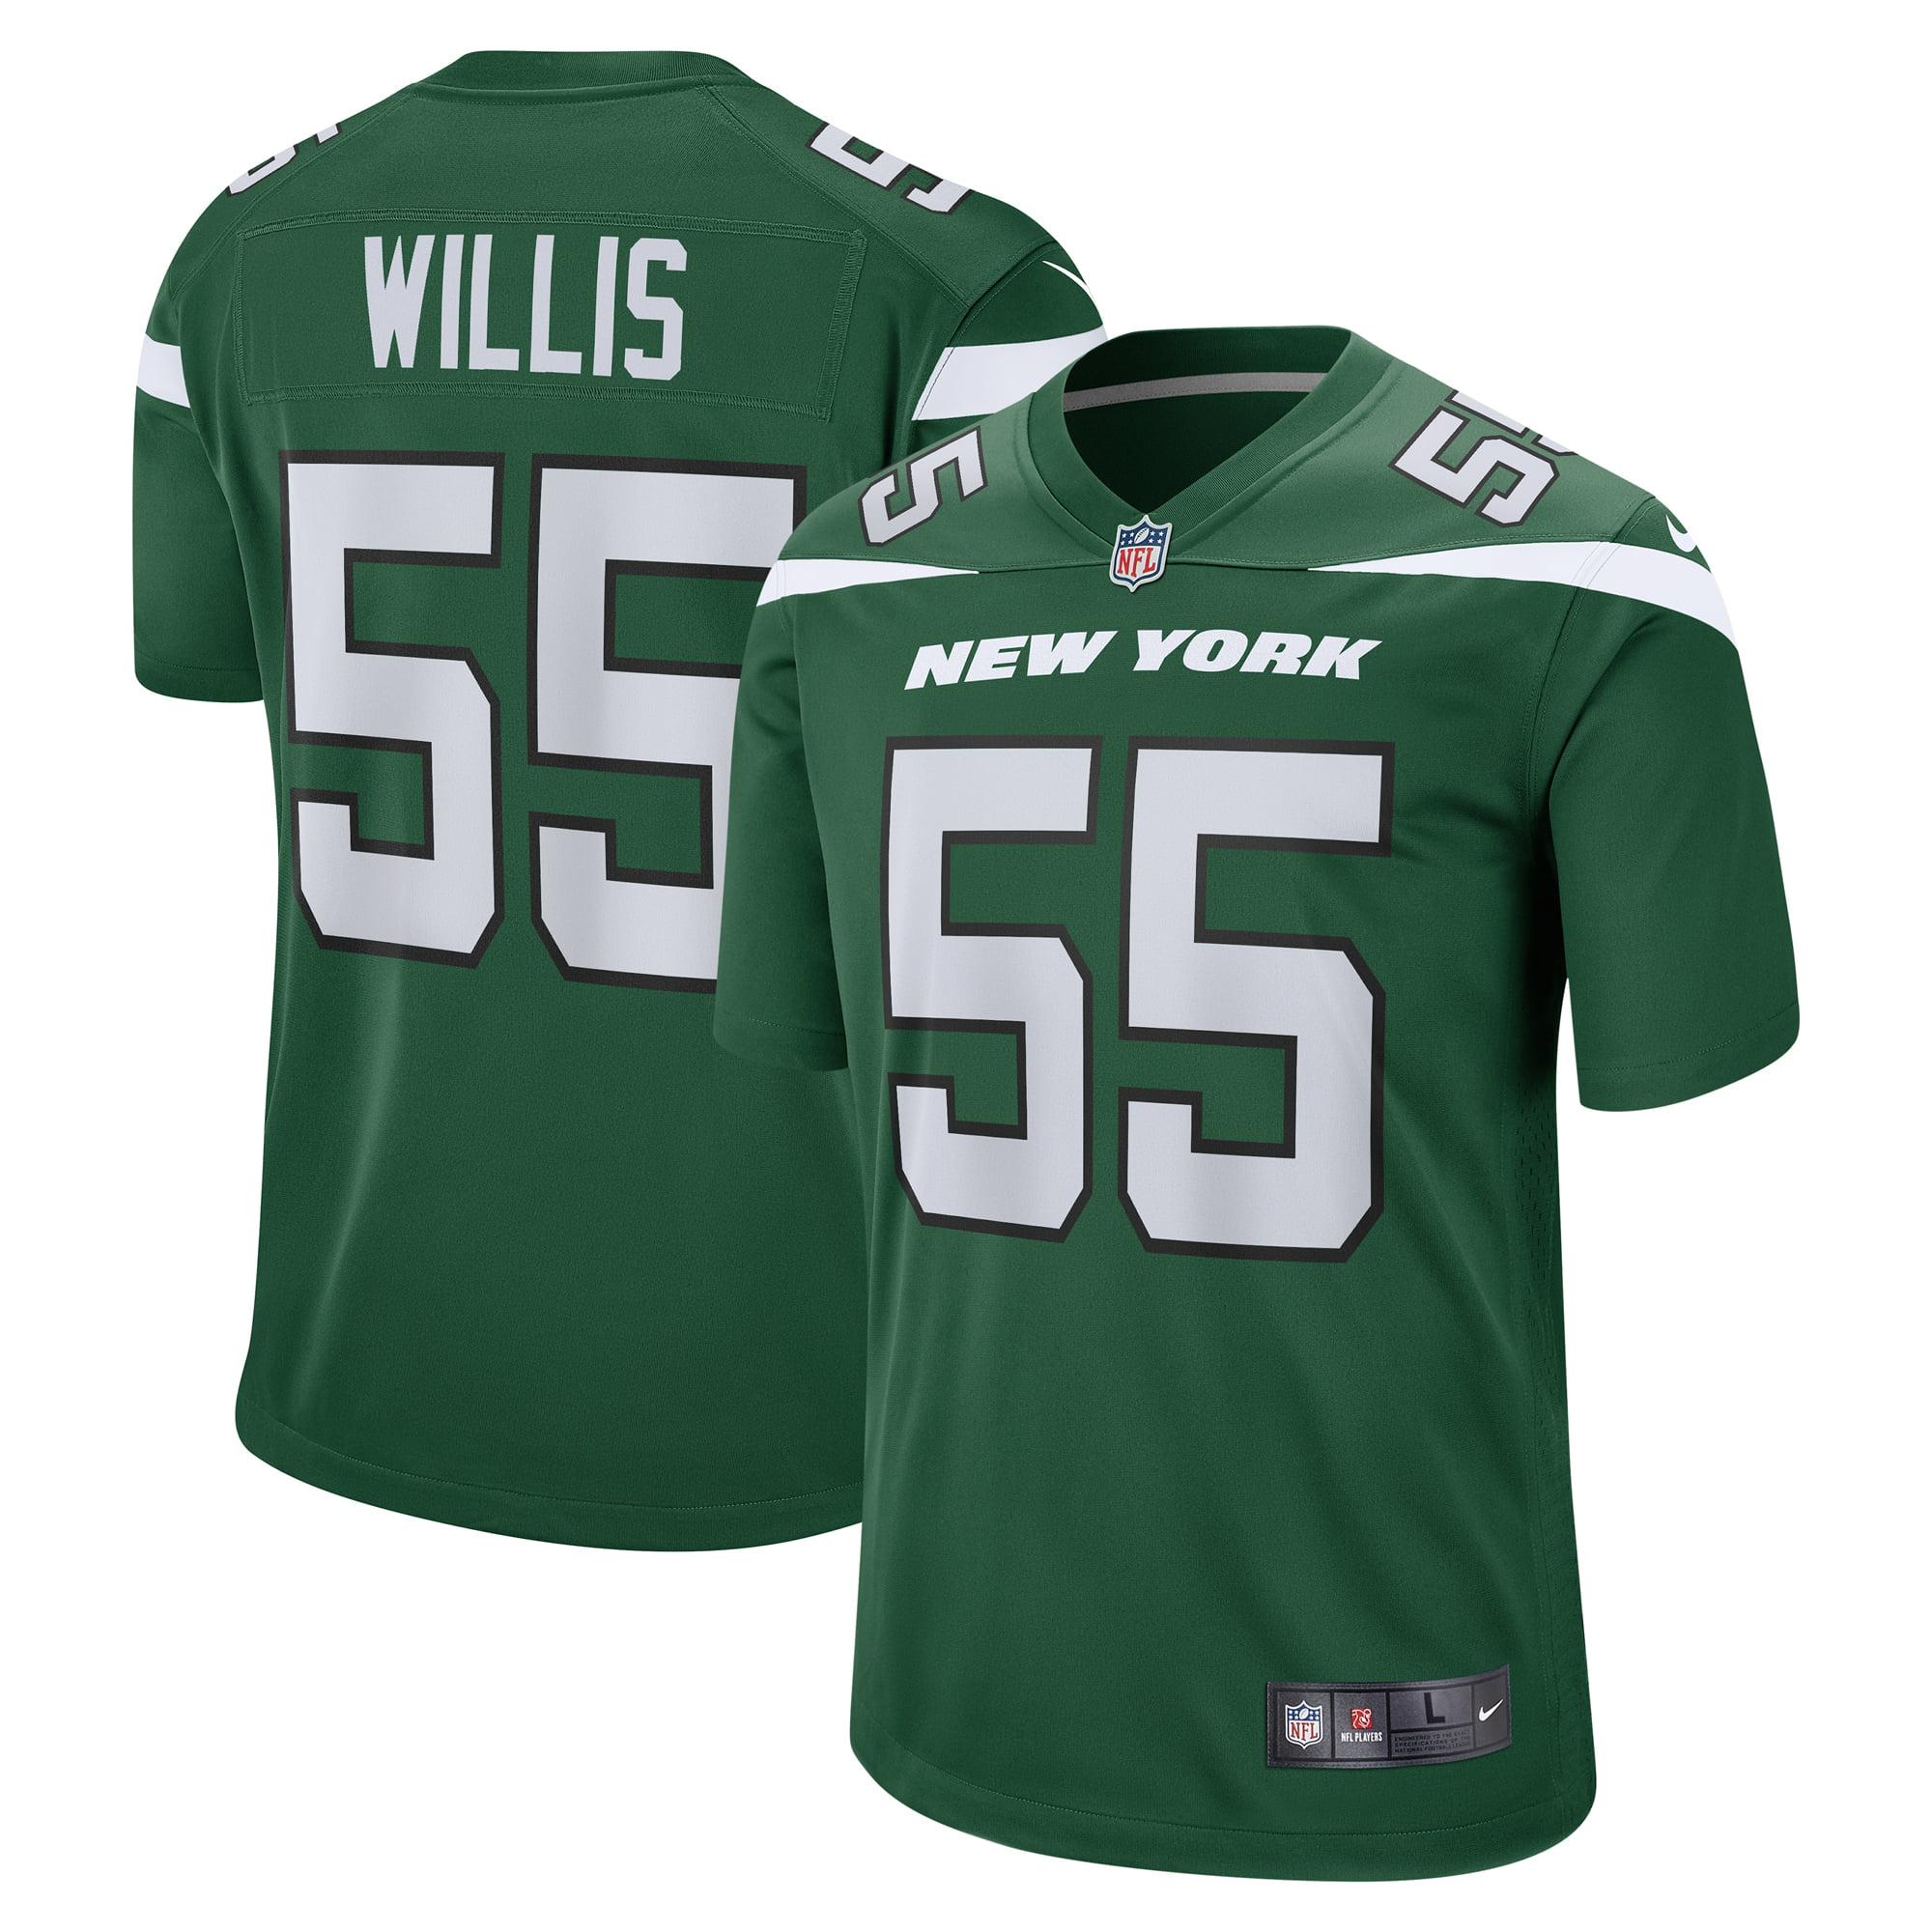 Jordan Willis New York Jets Nike Game Jersey - Gotham Green - Walmart.com